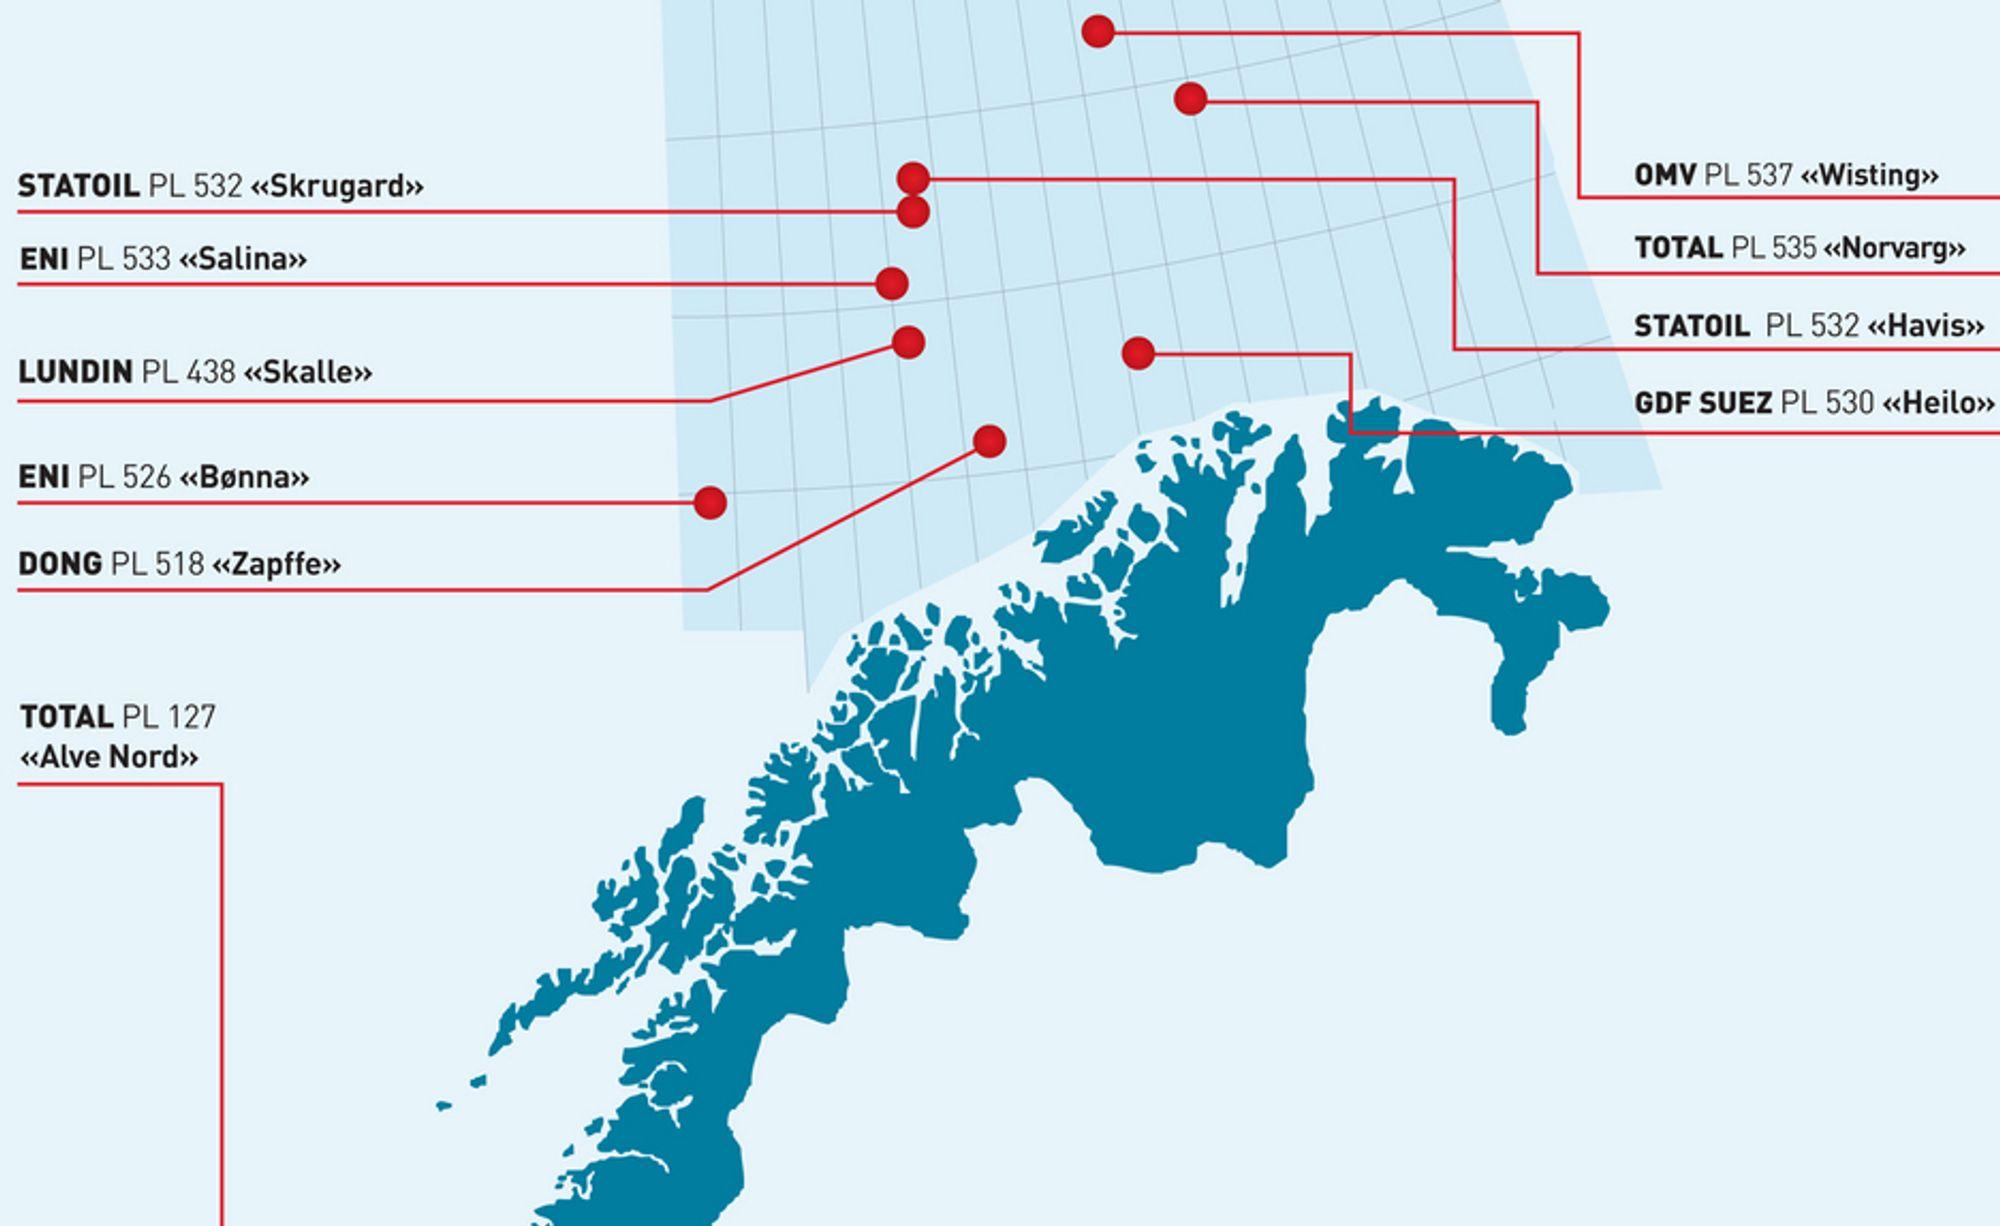 BOREBONANZA: ODs favorittliste viser flere spennende brønner som er planlagt boret i Barentshavet i 2012.